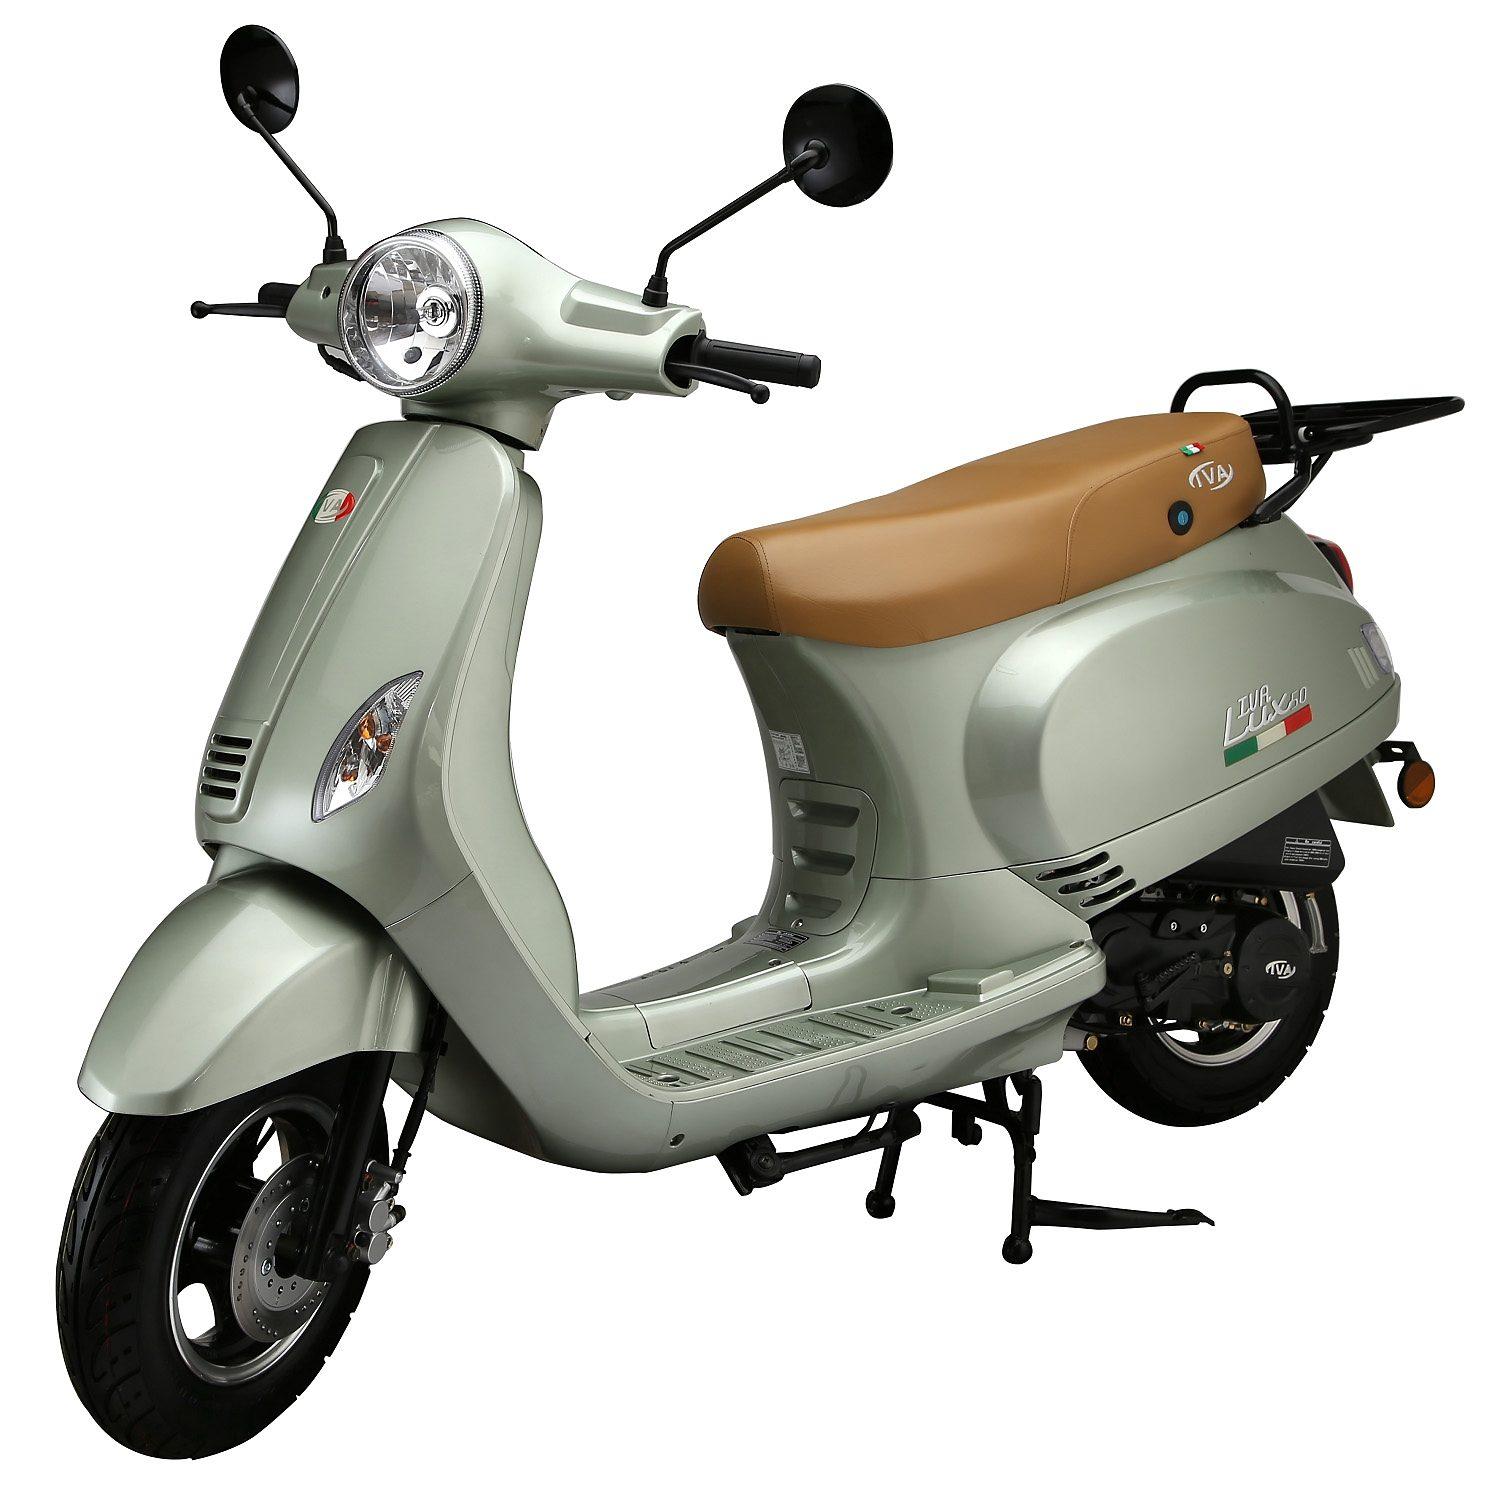 Mofaroller, 50 ccm, 3 PS, 25 km/h, für 1 Person, mintgrün, »LUX«, IVA